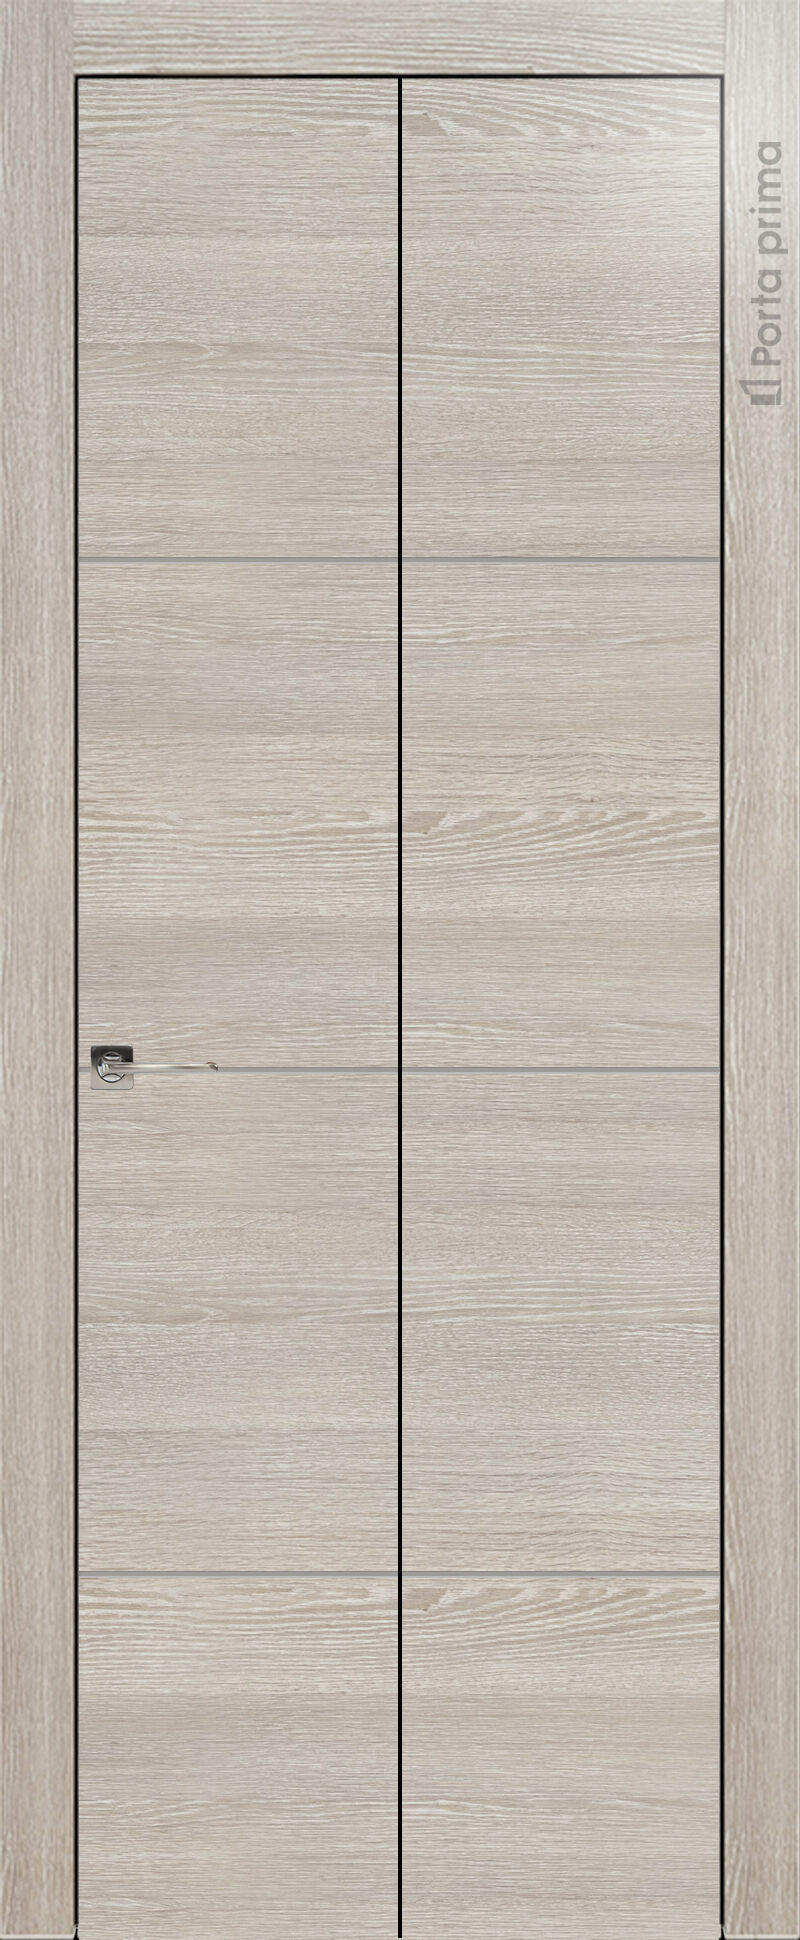 Tivoli Г-2 Книжка цвет - Серый дуб Без стекла (ДГ)